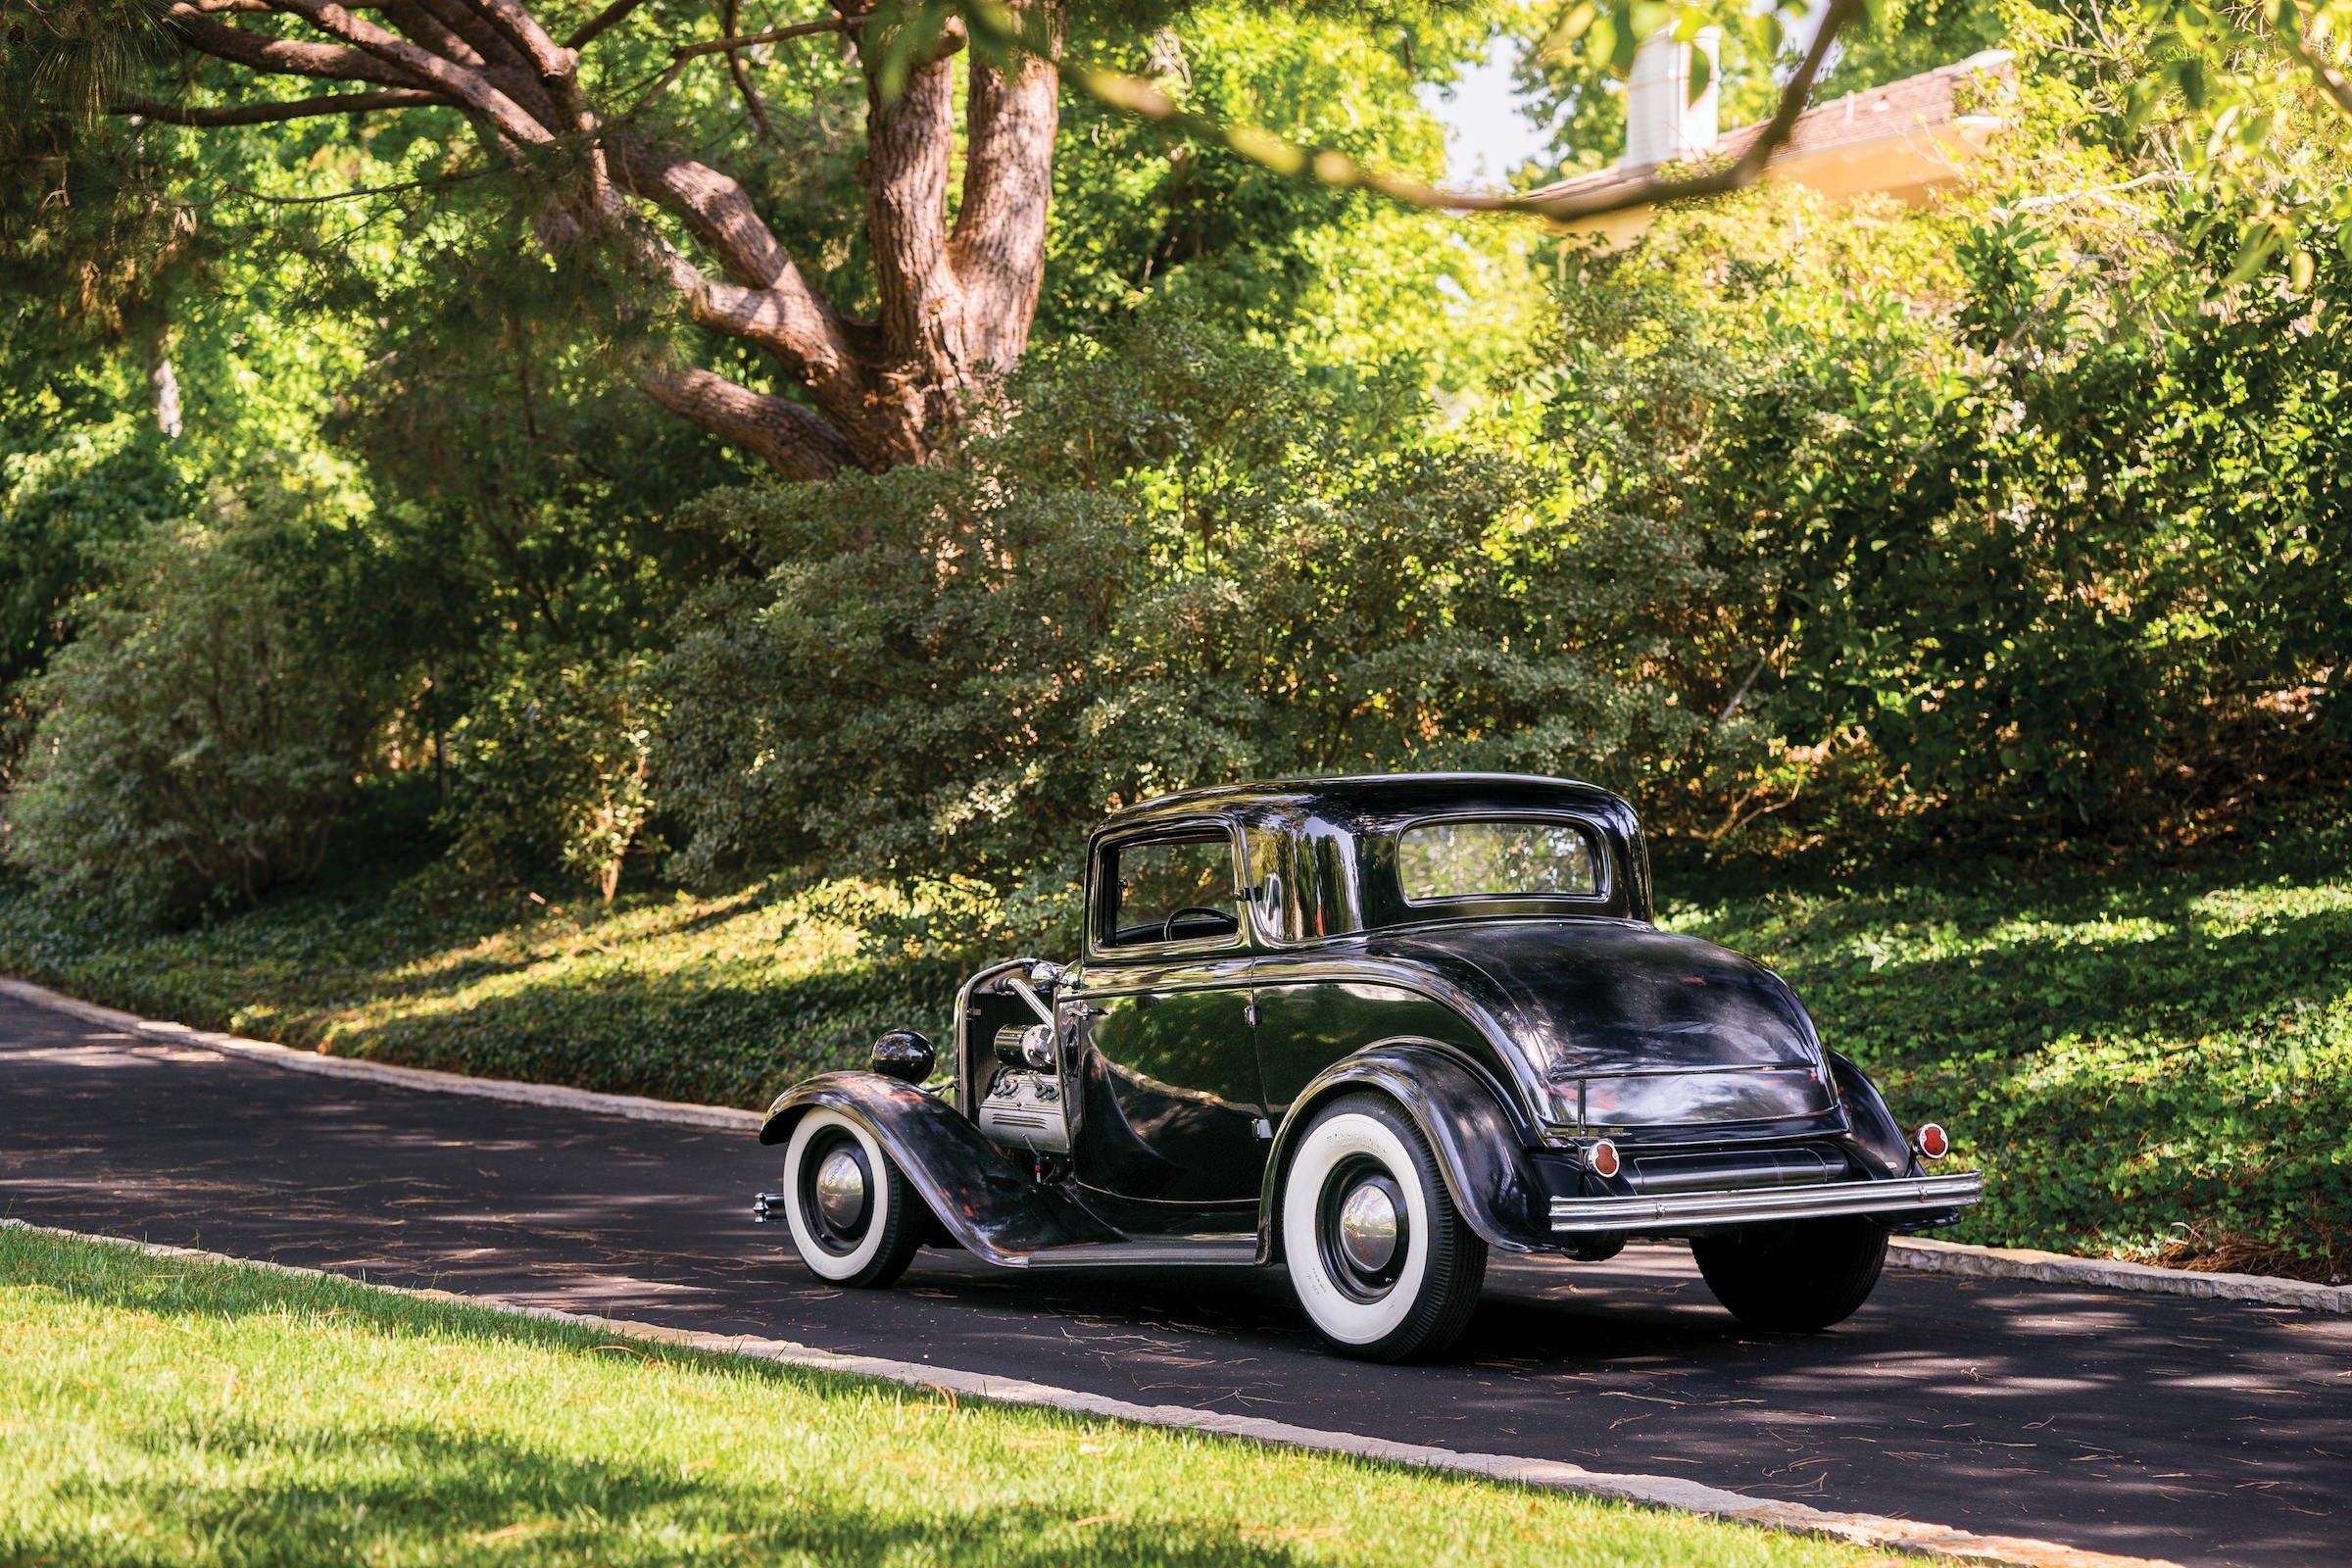 1932 Ford Three-Window Hot Rod